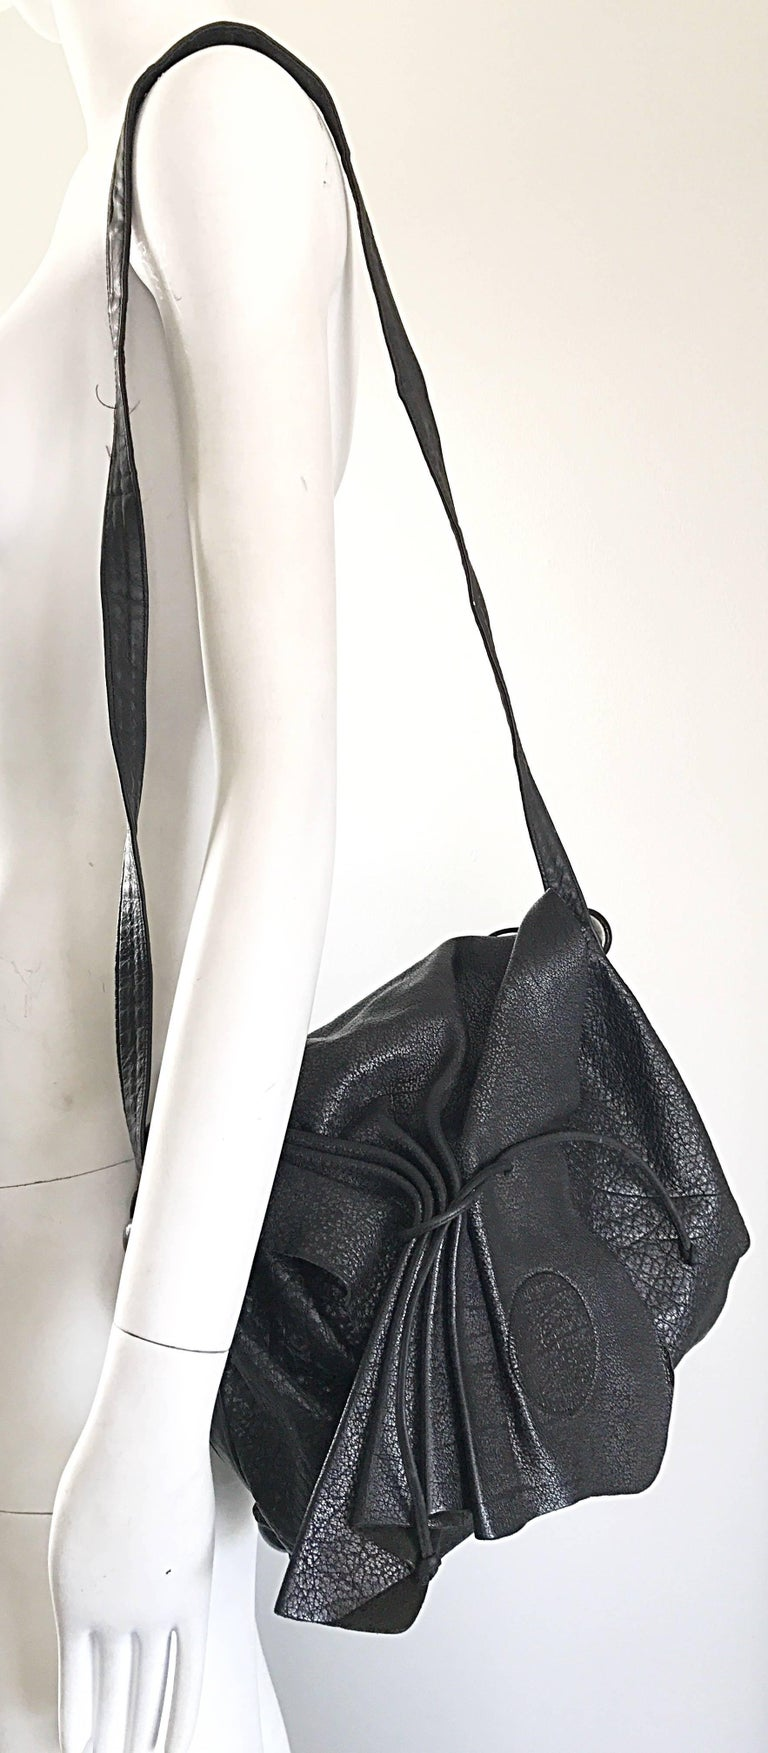 Vintage Carlos Falchi Black Buffalo Leather Shoulder Bag or Crossbody Purse For Sale 2